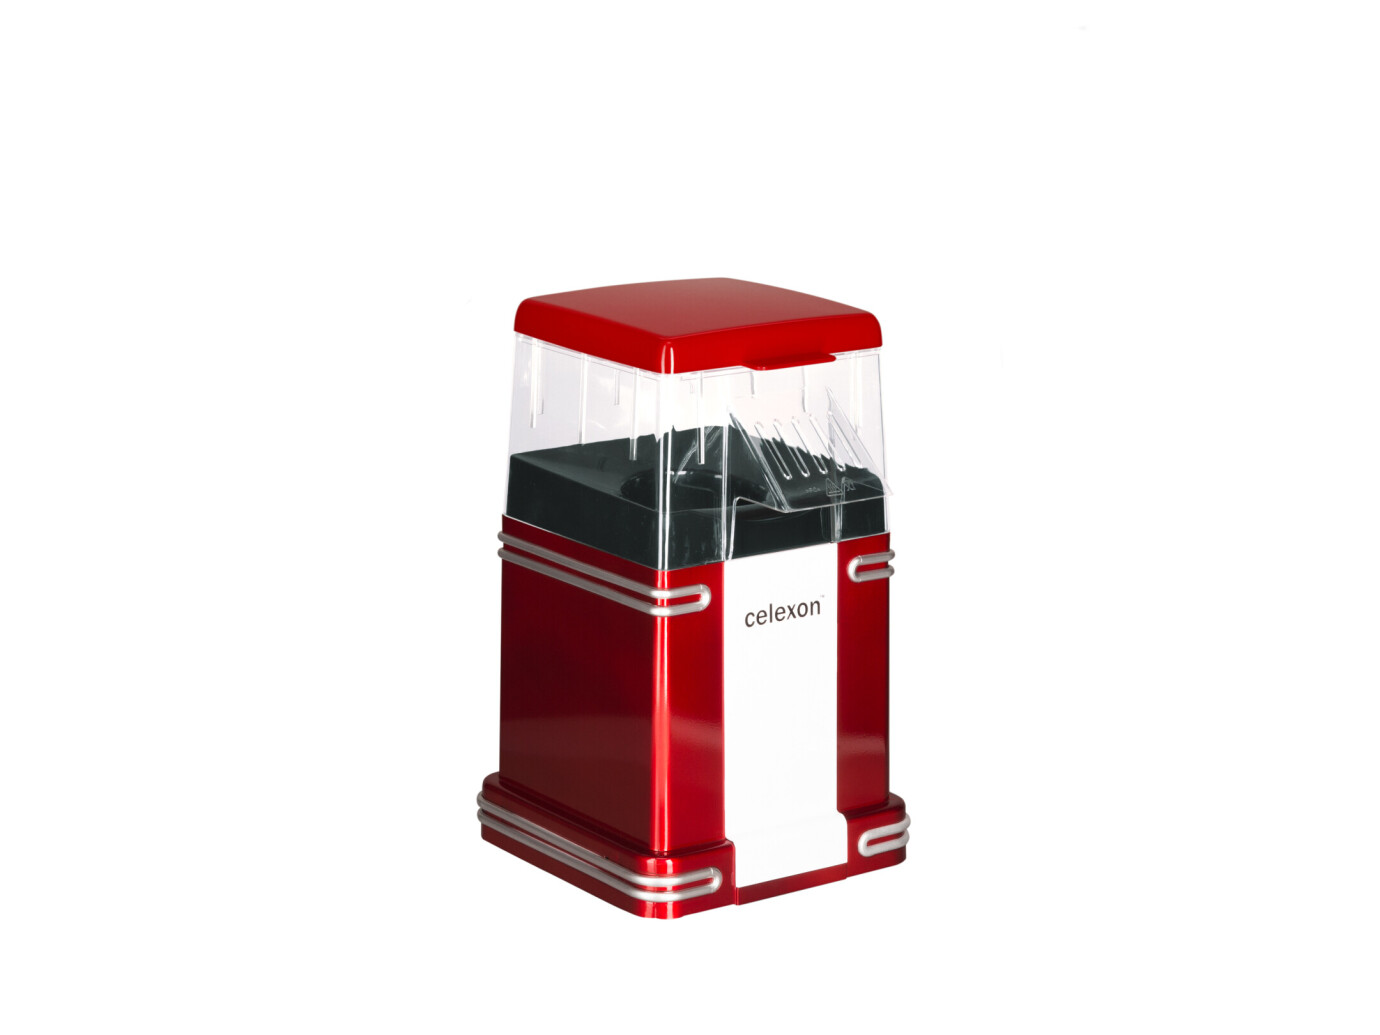 celexon CinePop CP250 Popcornmaschine